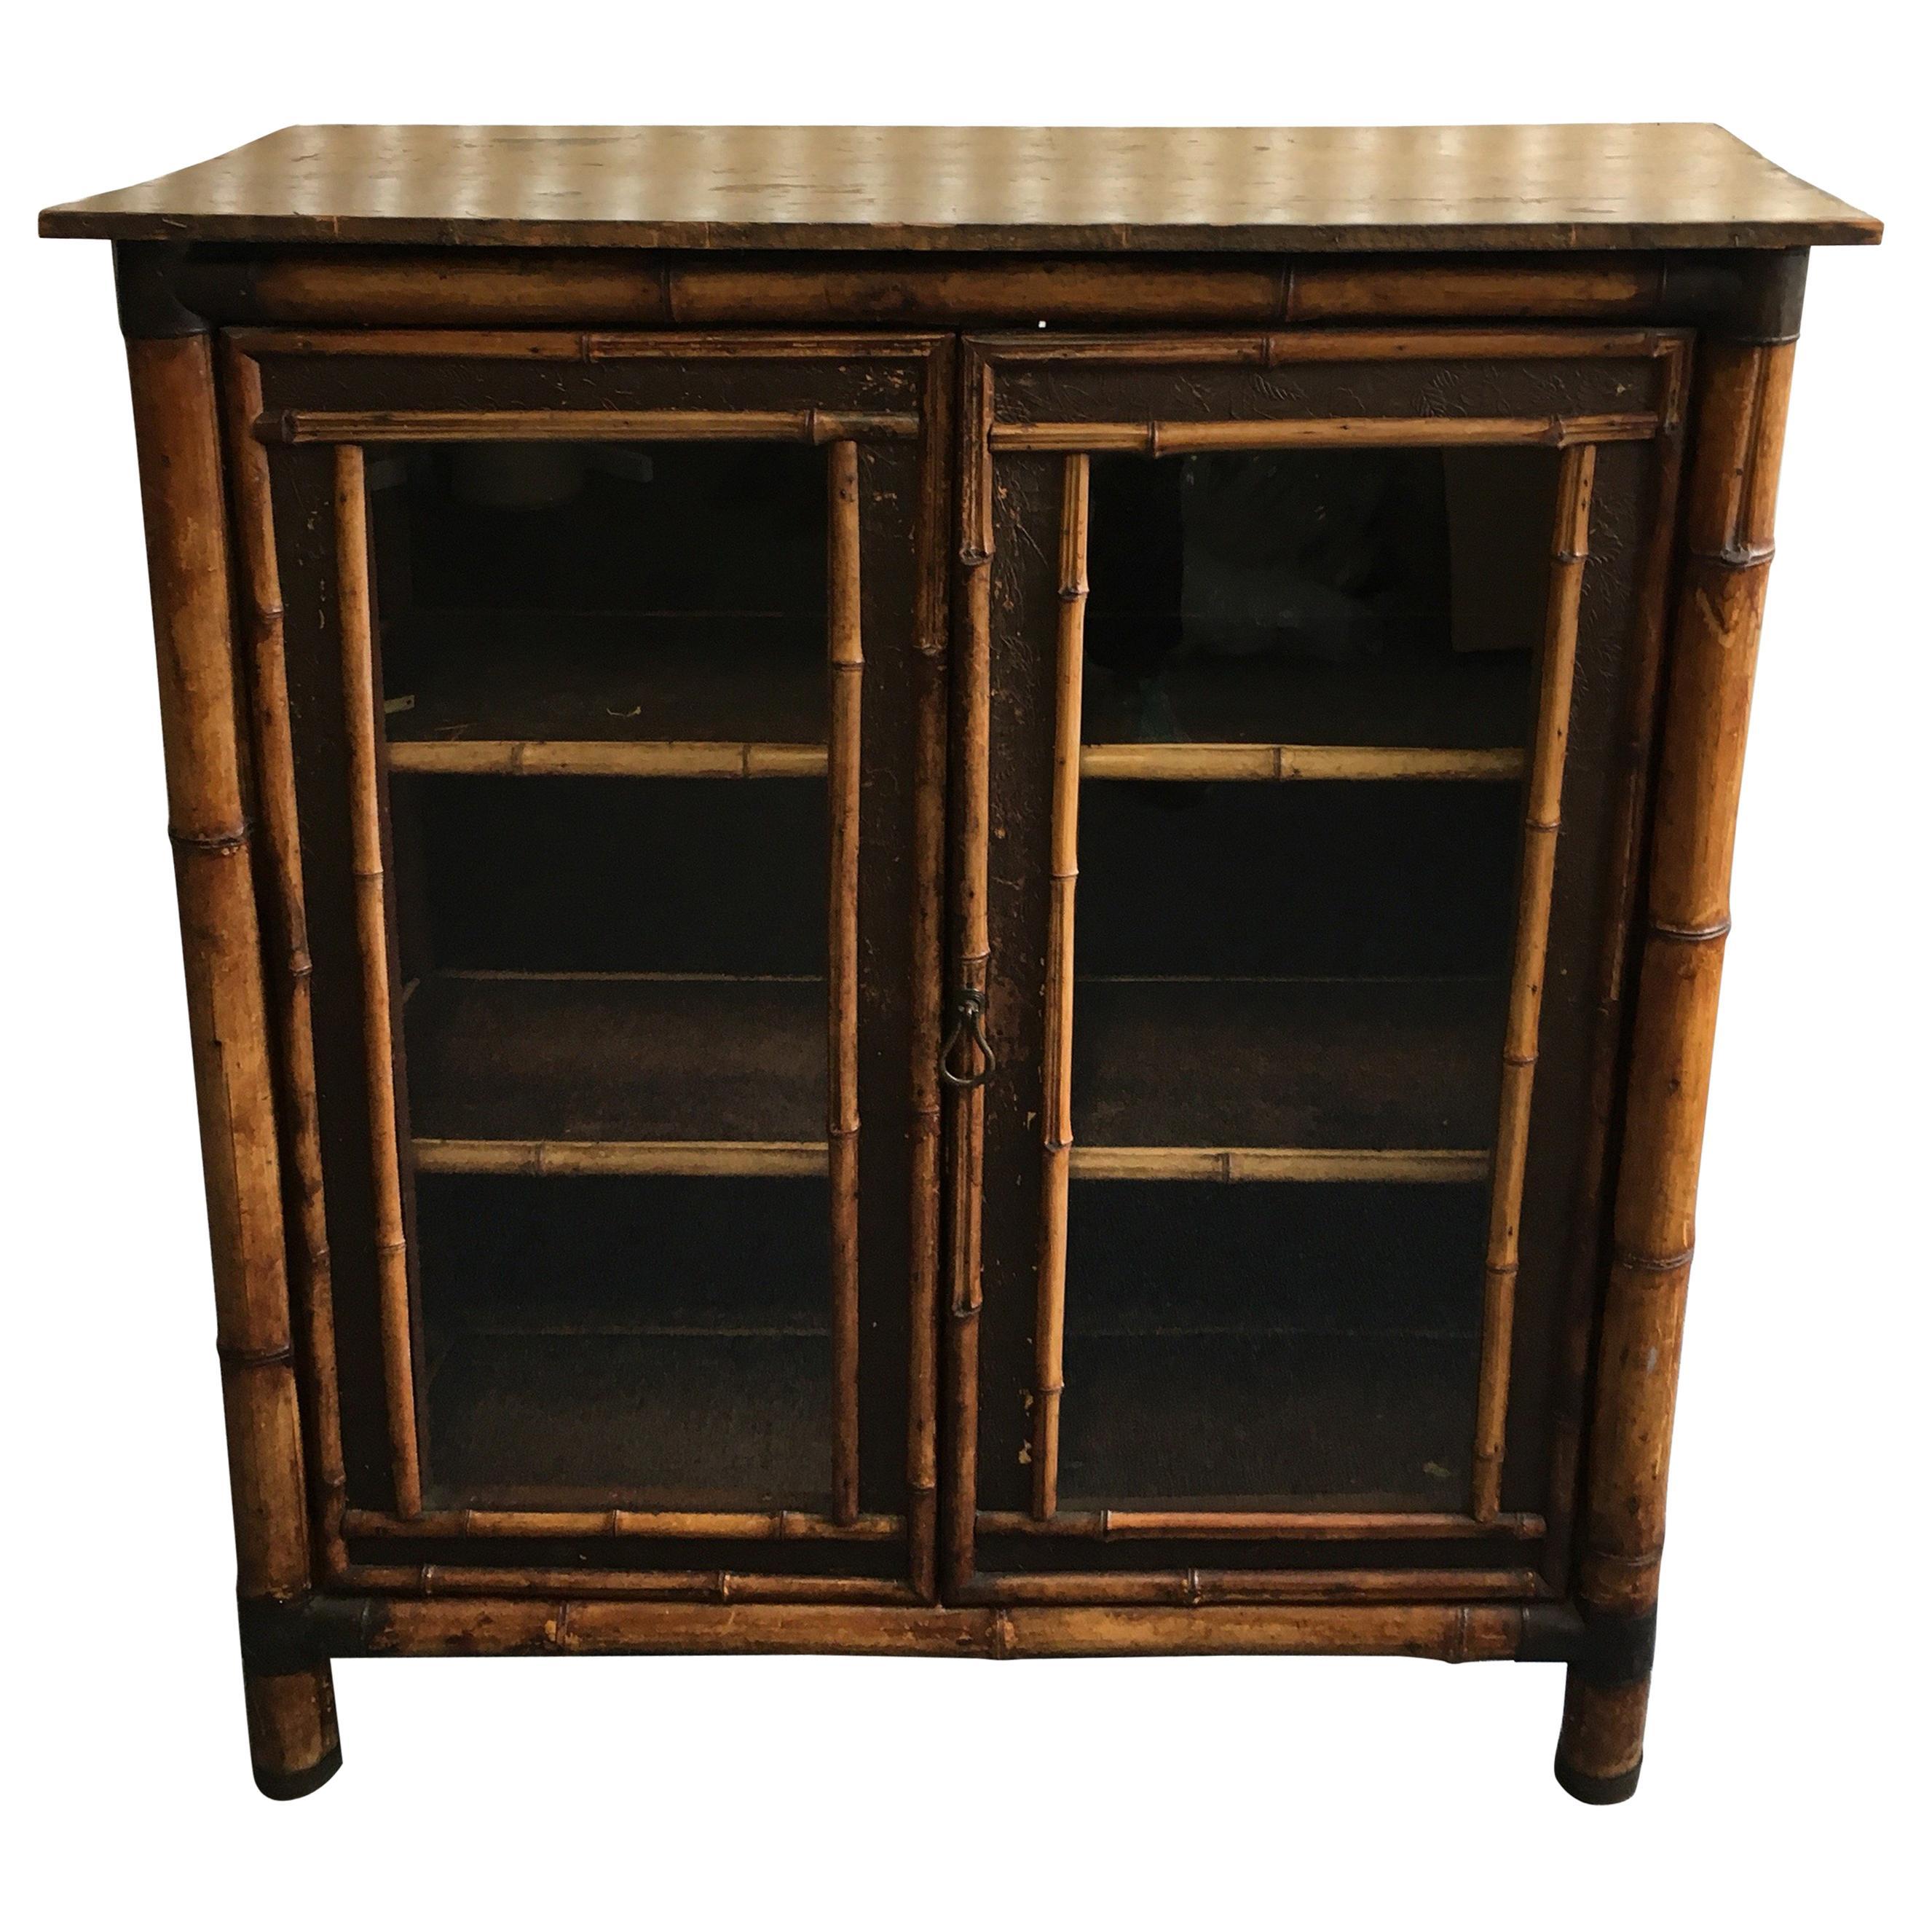 19th Century English Bamboo Bookcase